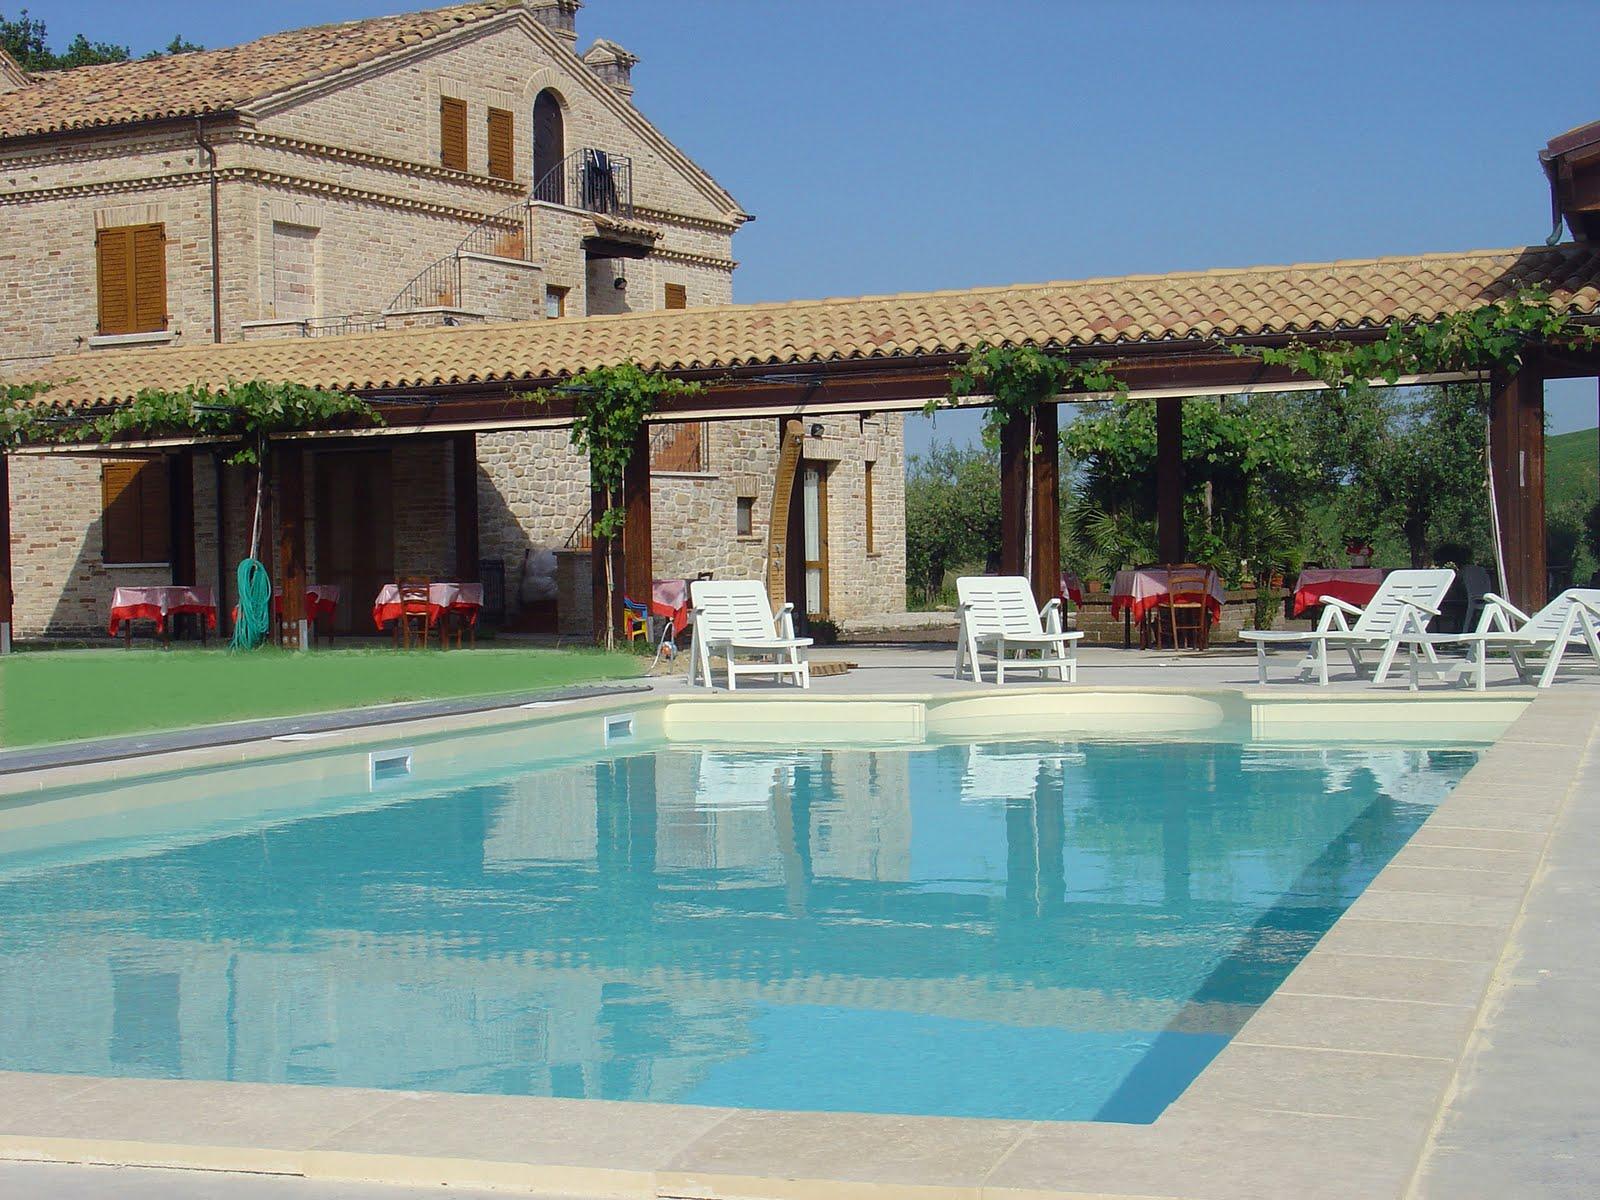 Zwembad achtergronden hd wallpapers for Piani del cortile con piscine